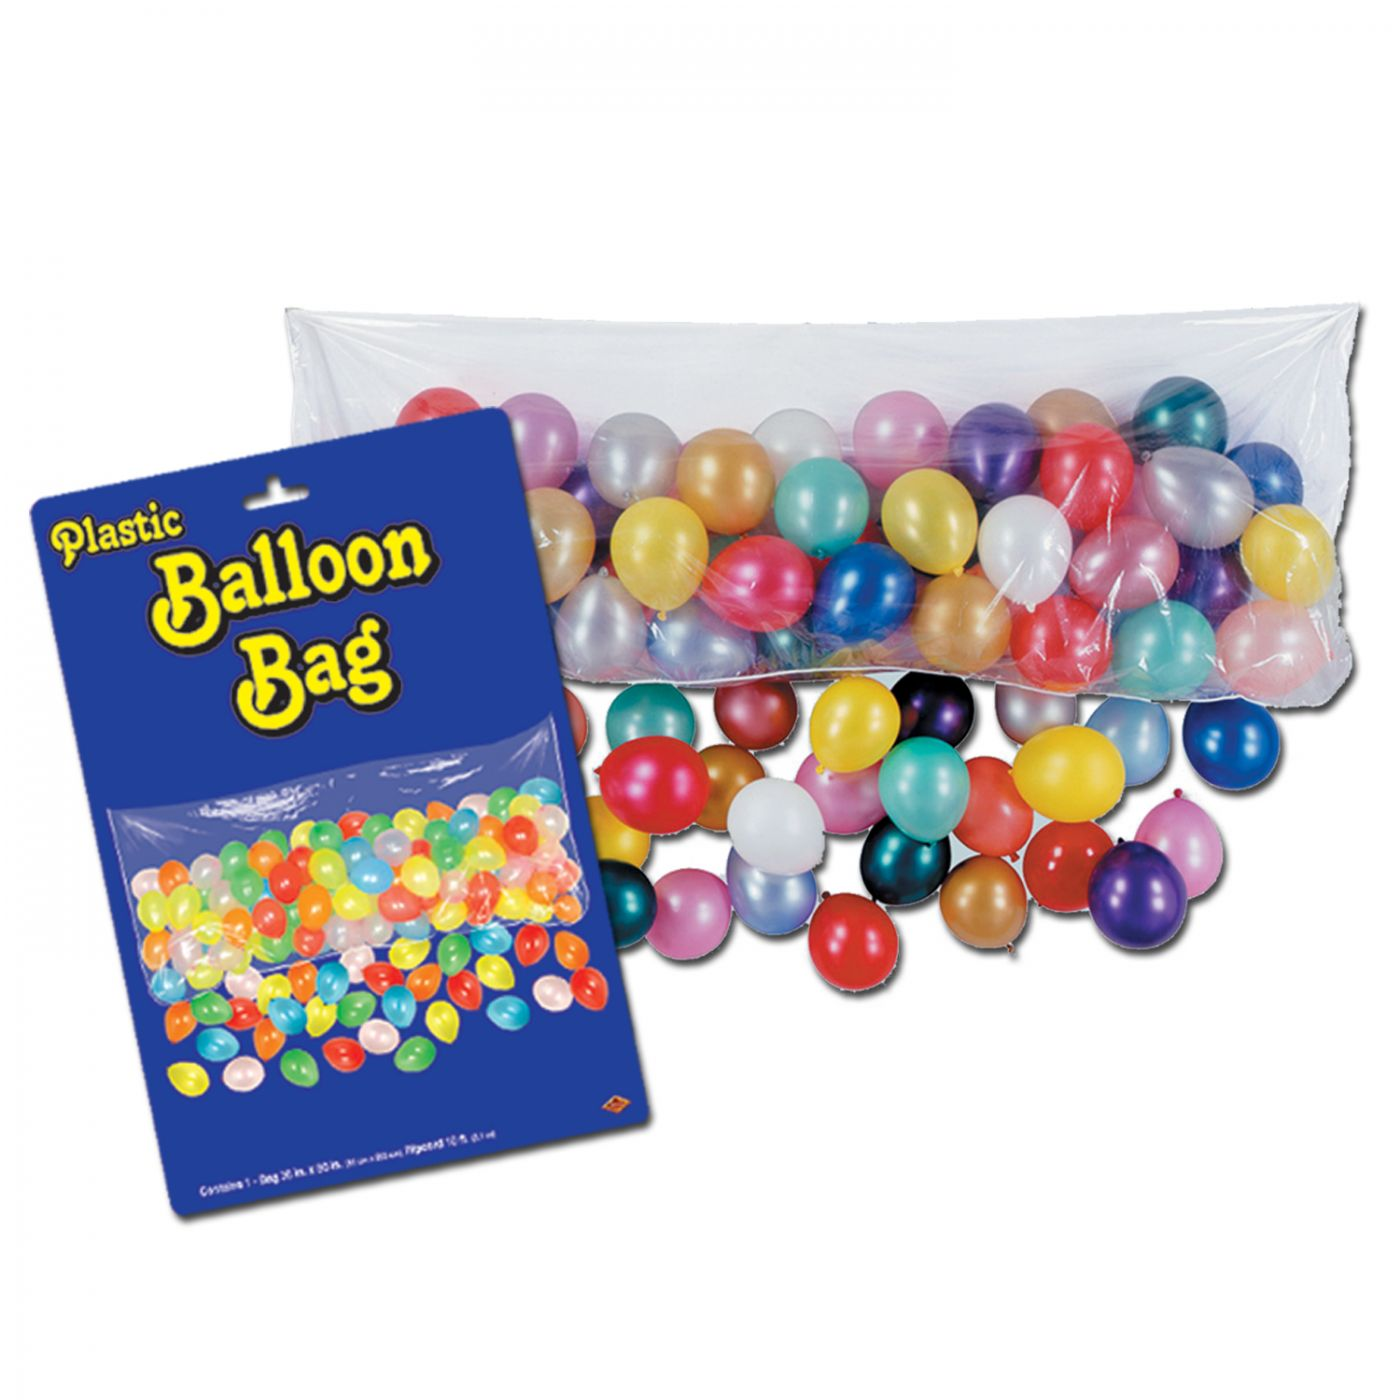 Plastic Balloon Bag w/100 Balloons image